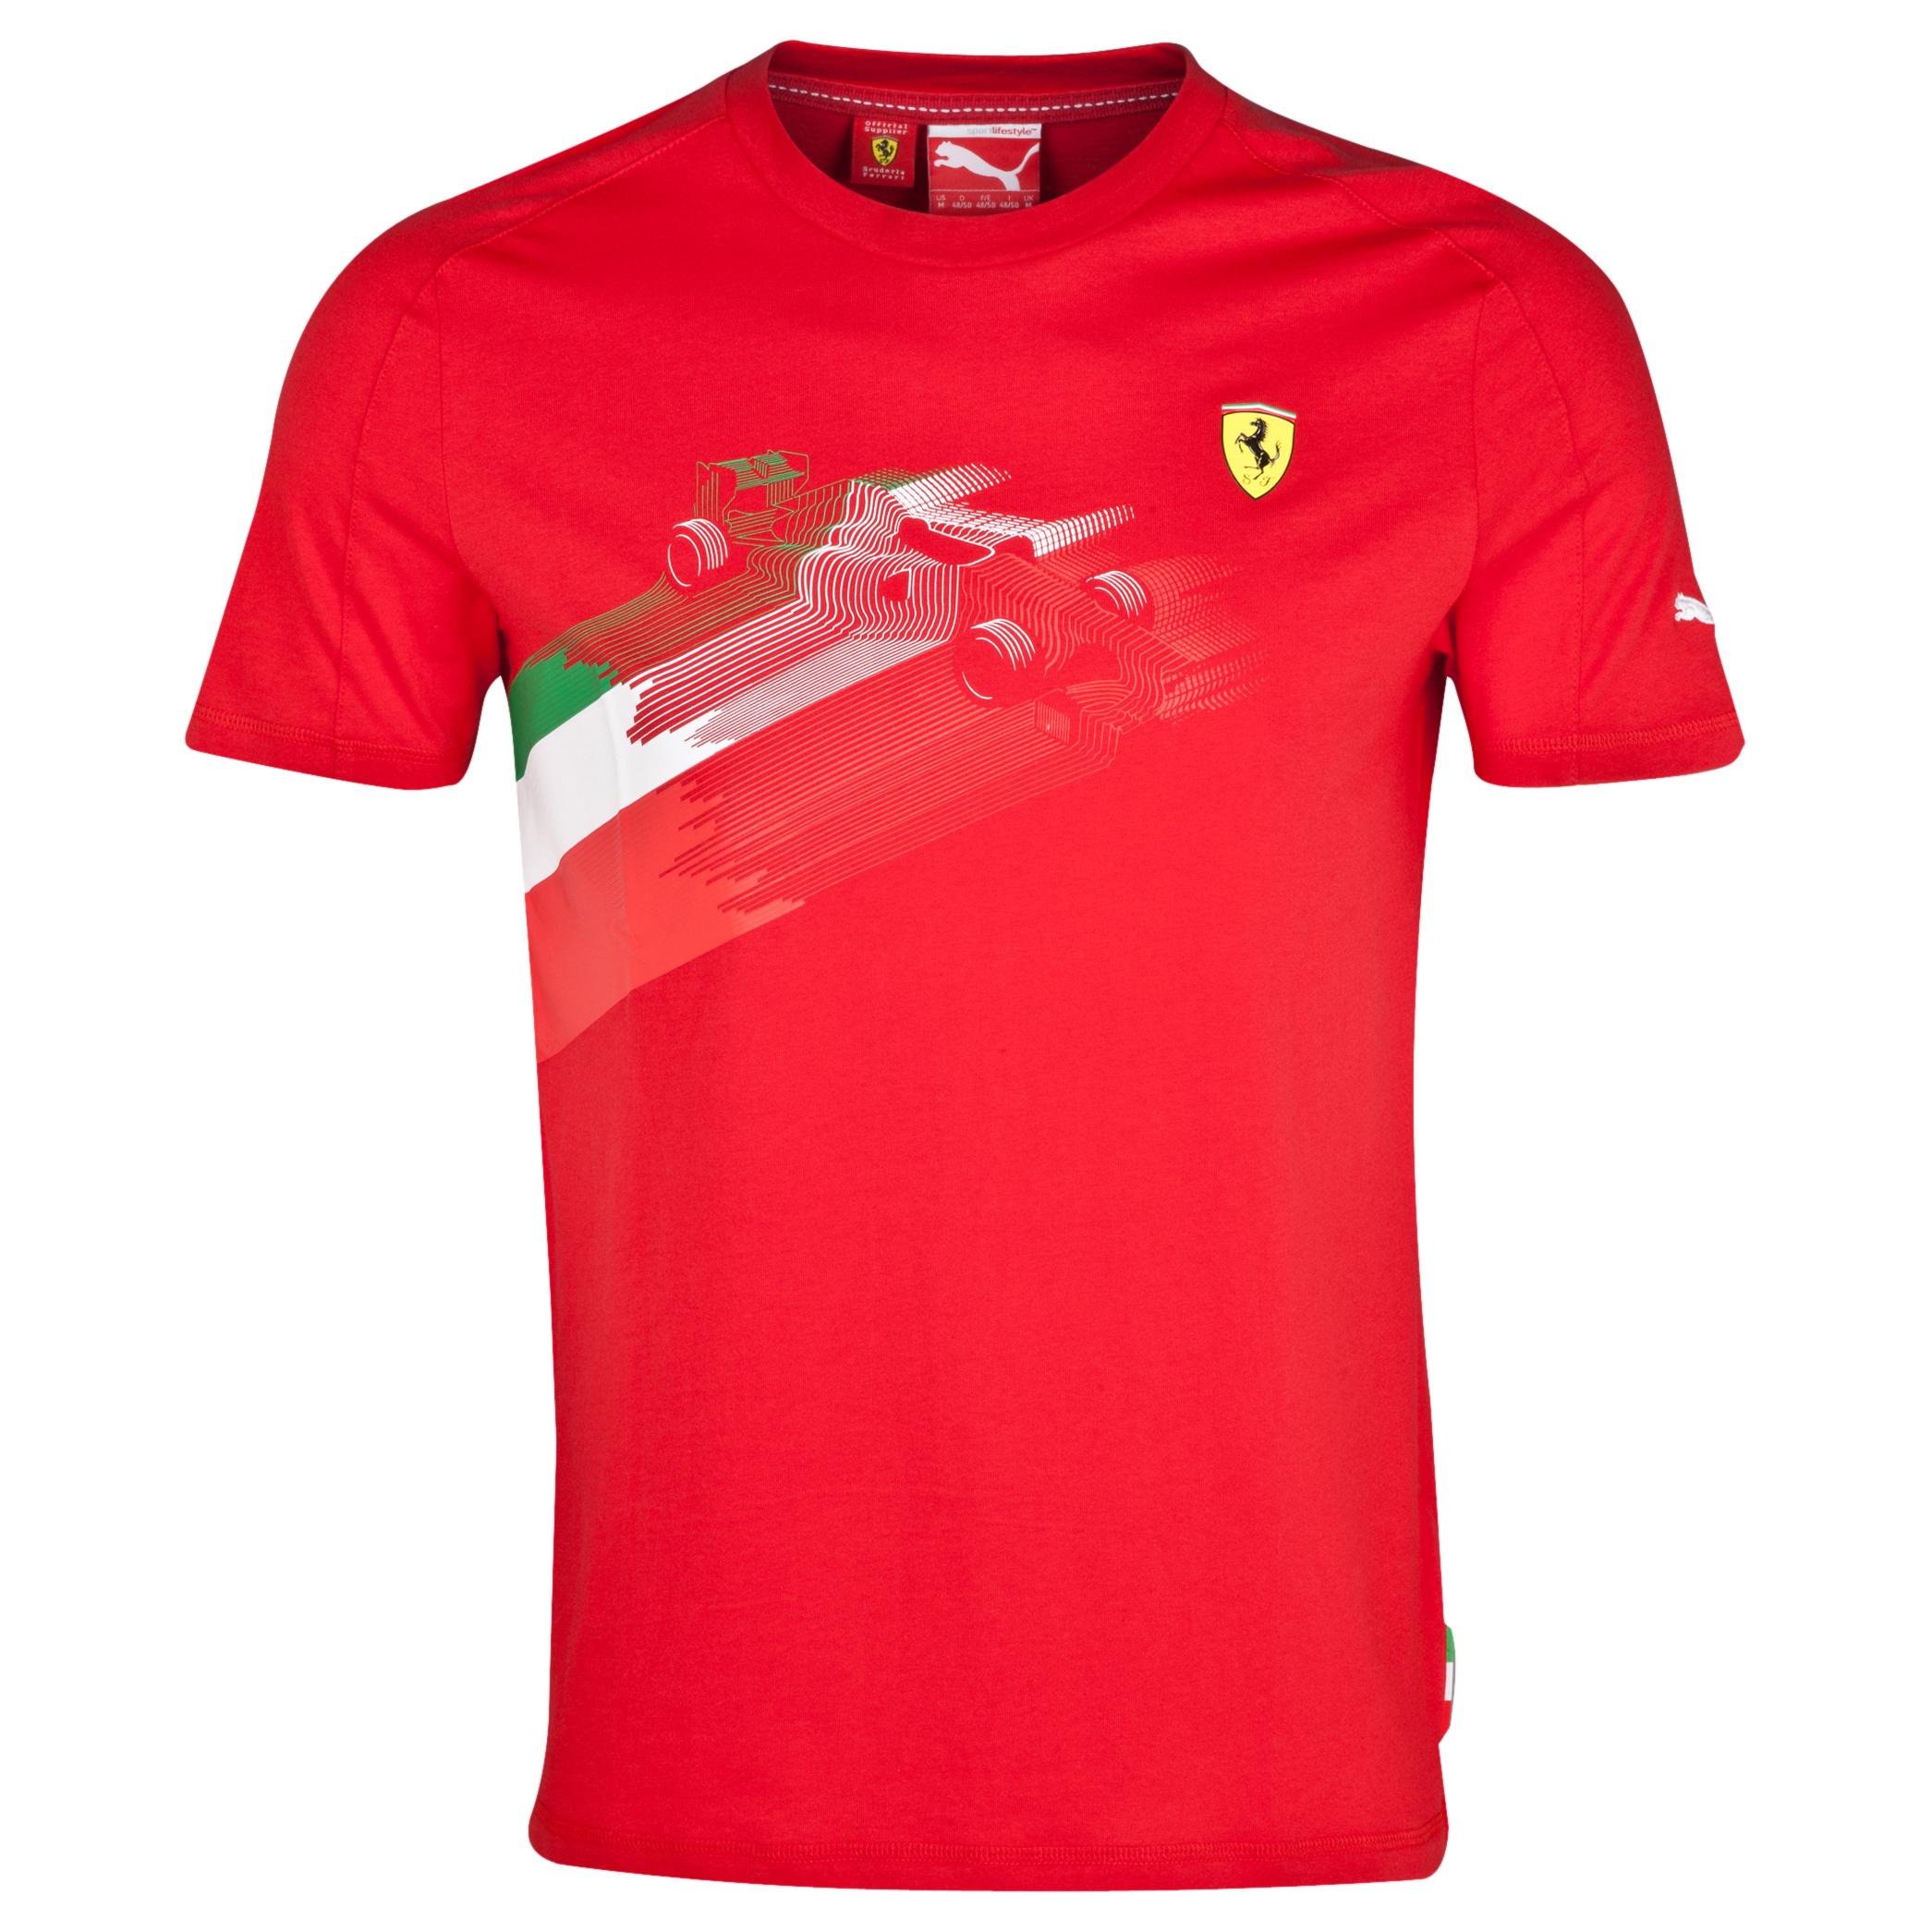 Scuderia Ferrari Triclour Car Graphic T-Shirt Red